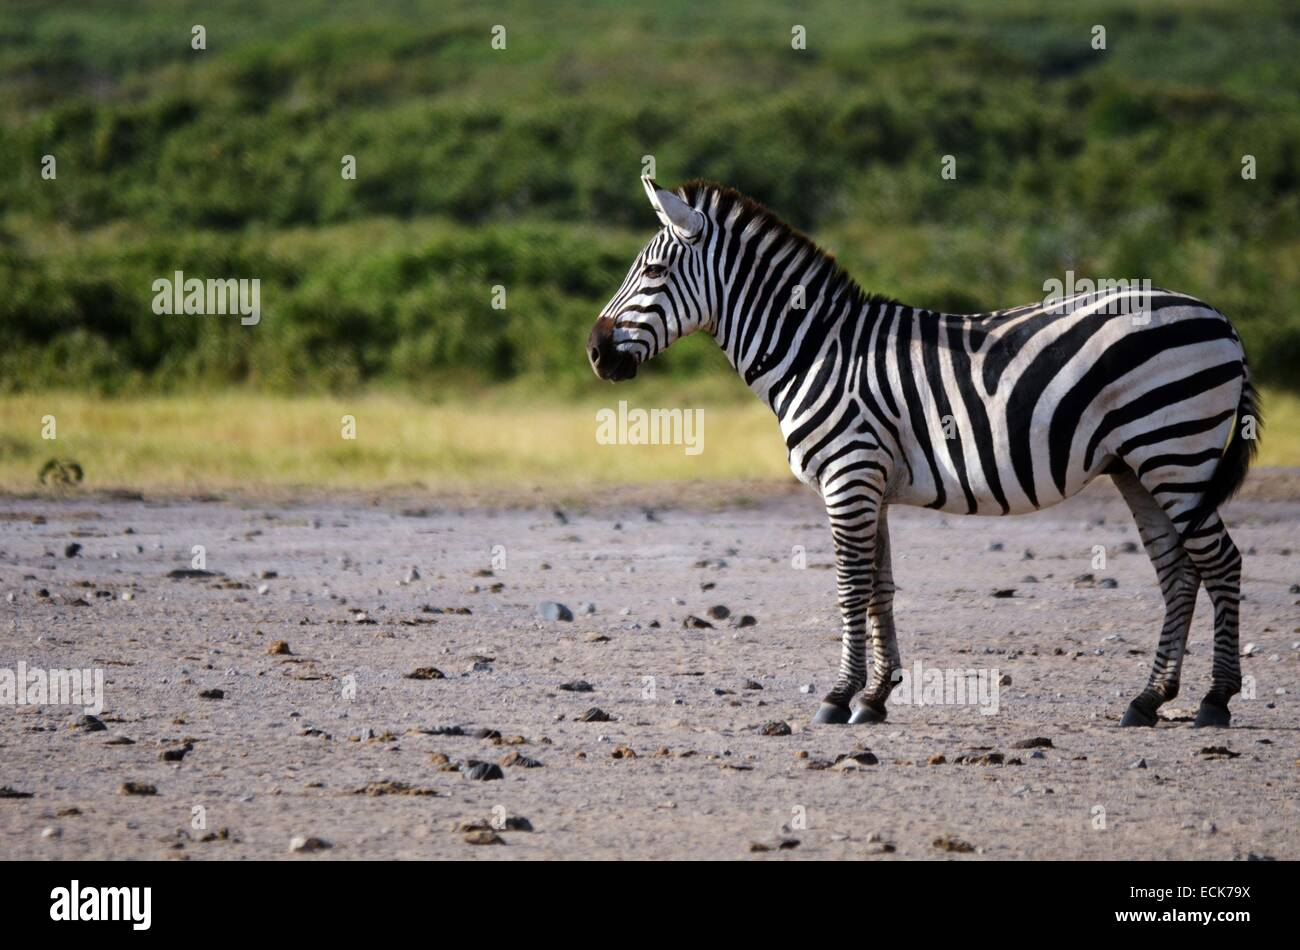 Kenya, Amboseli National Park, lonely Grant's zebra (Equus burchelli granti) - Stock Image